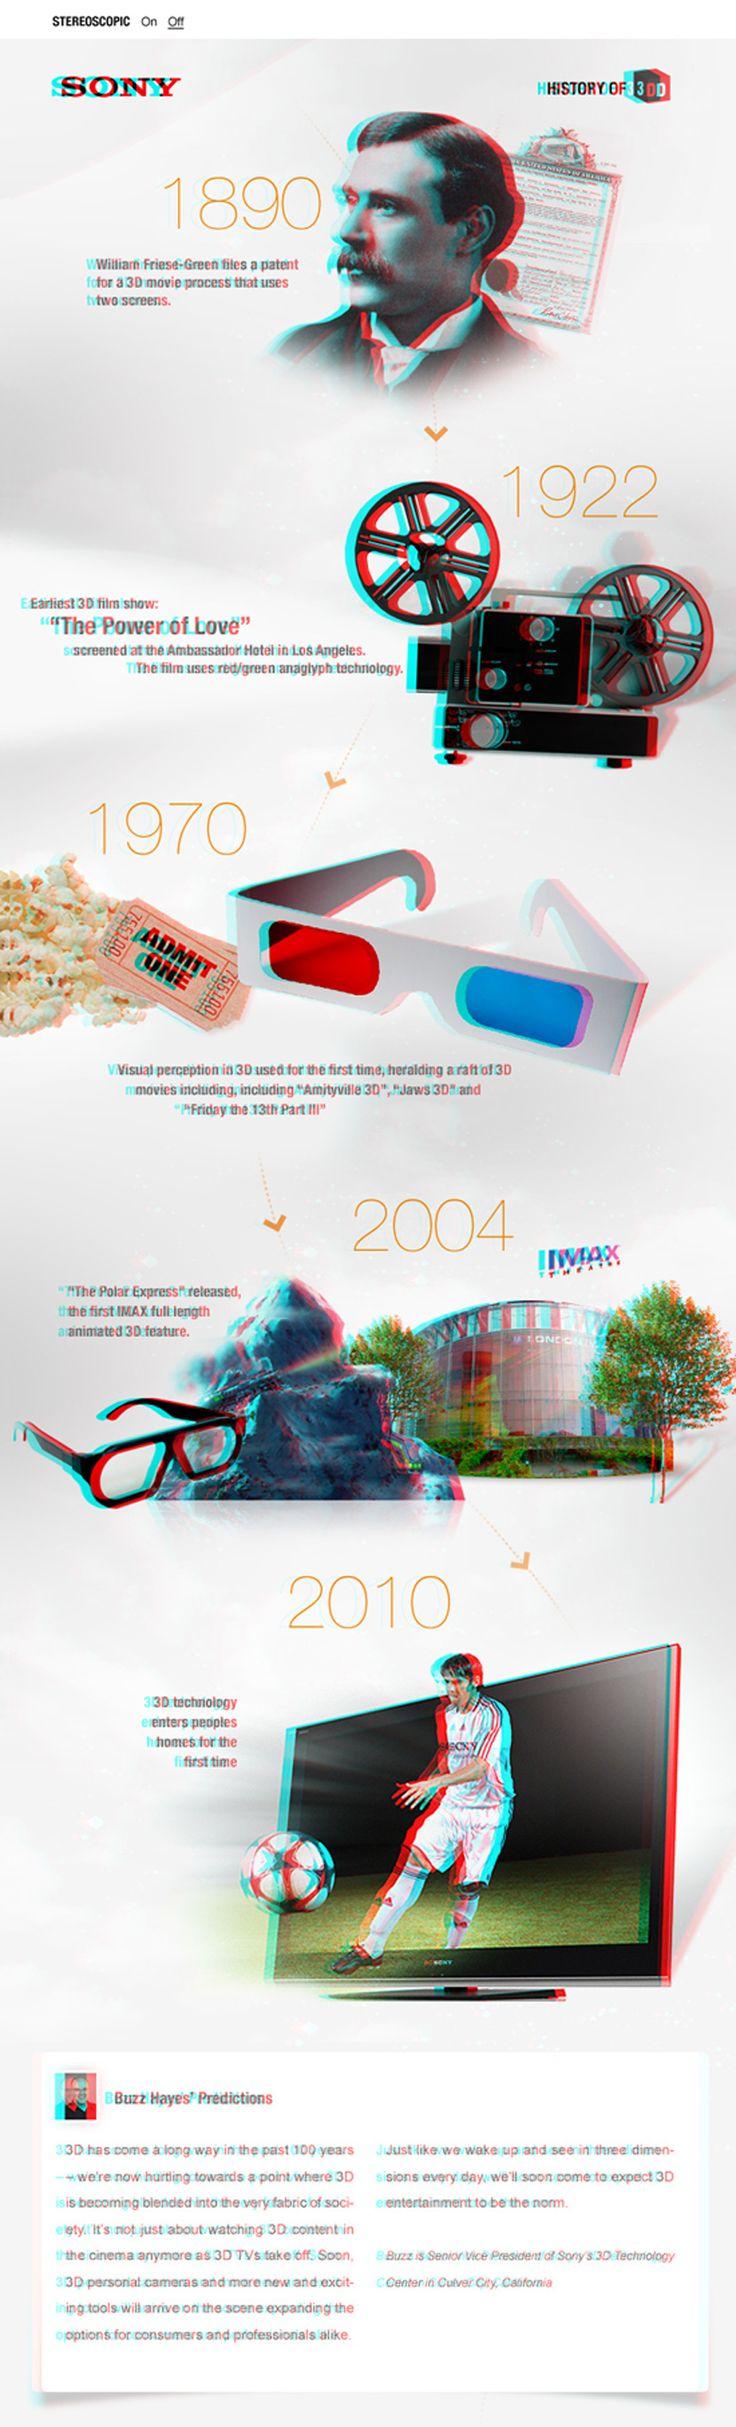 3 Creative DIY 3D Glasses For Samsung, Panasonic, Sony TV http://www.geckoandfly.com/12941/3-creative-diy-3d-glasses-samsung-panasonic-sony-tv/